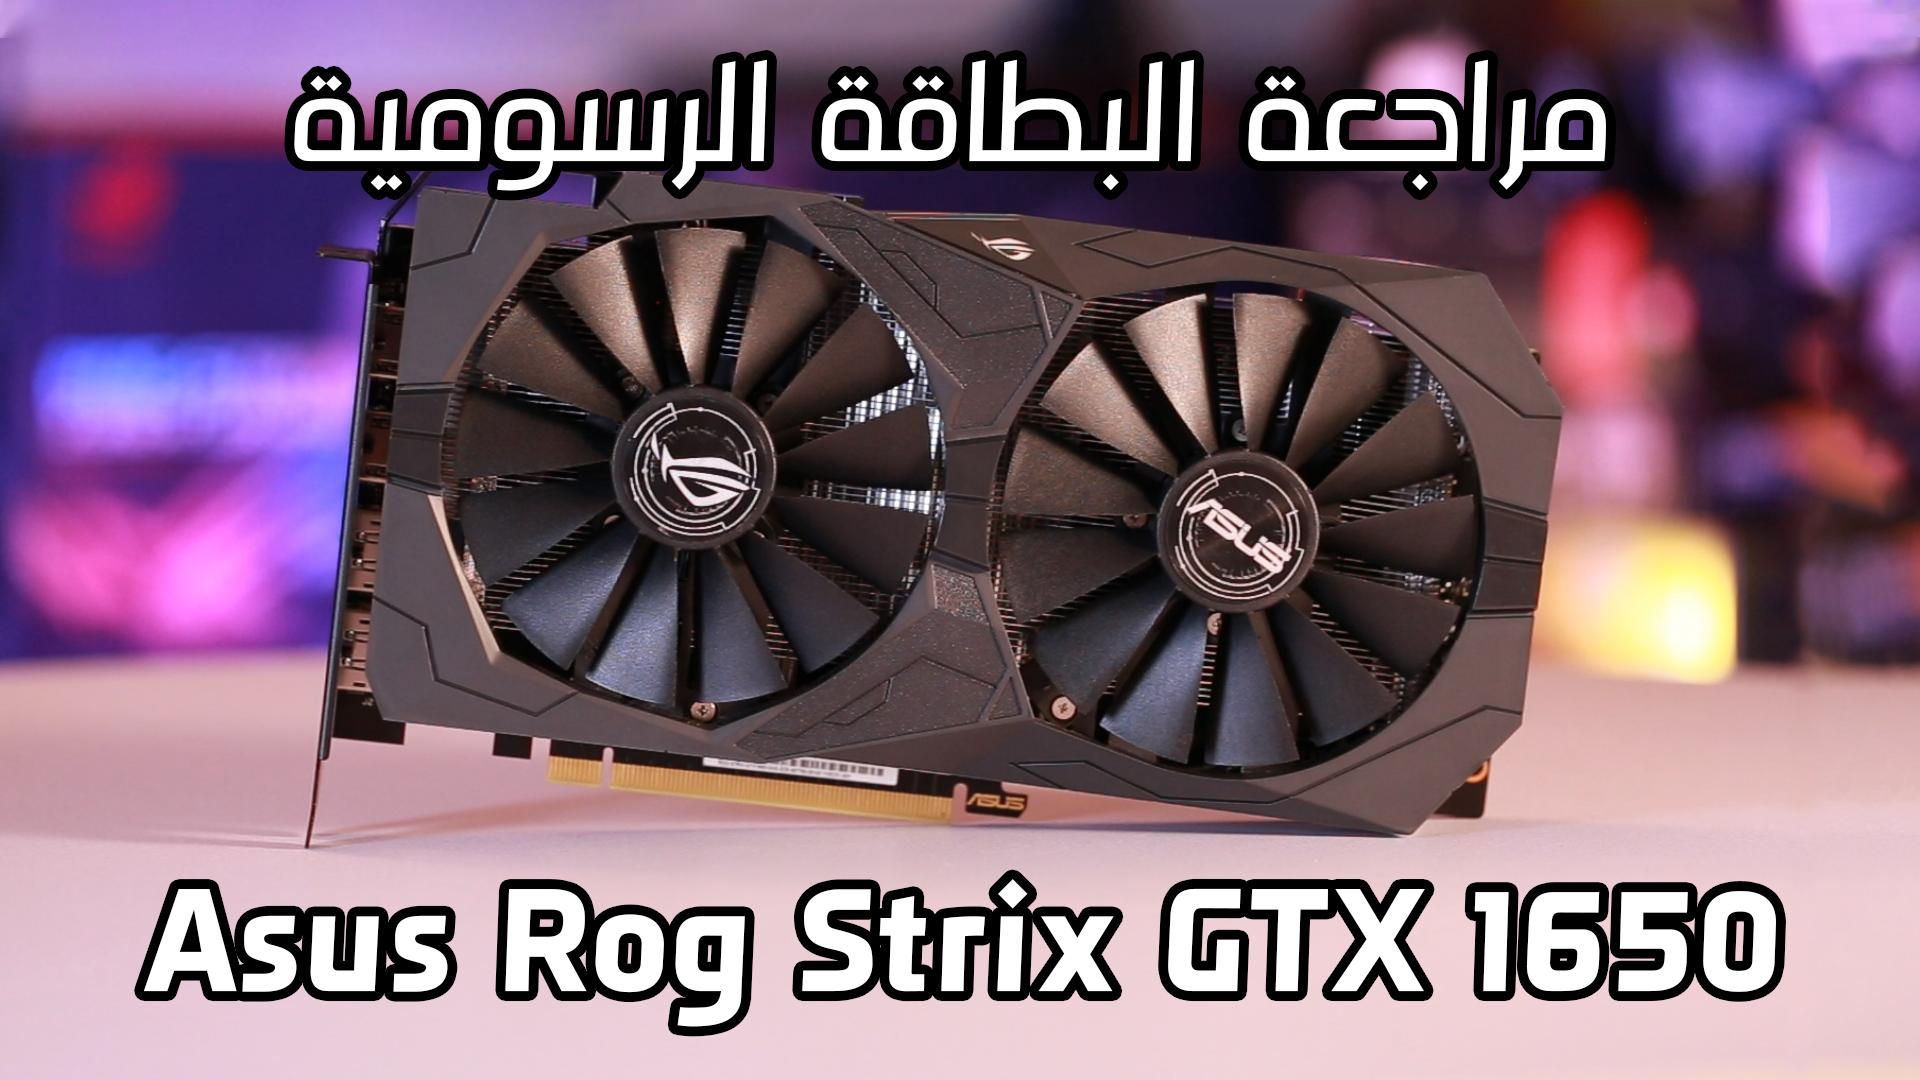 ASUS ROG Strix GTX 1650 OC